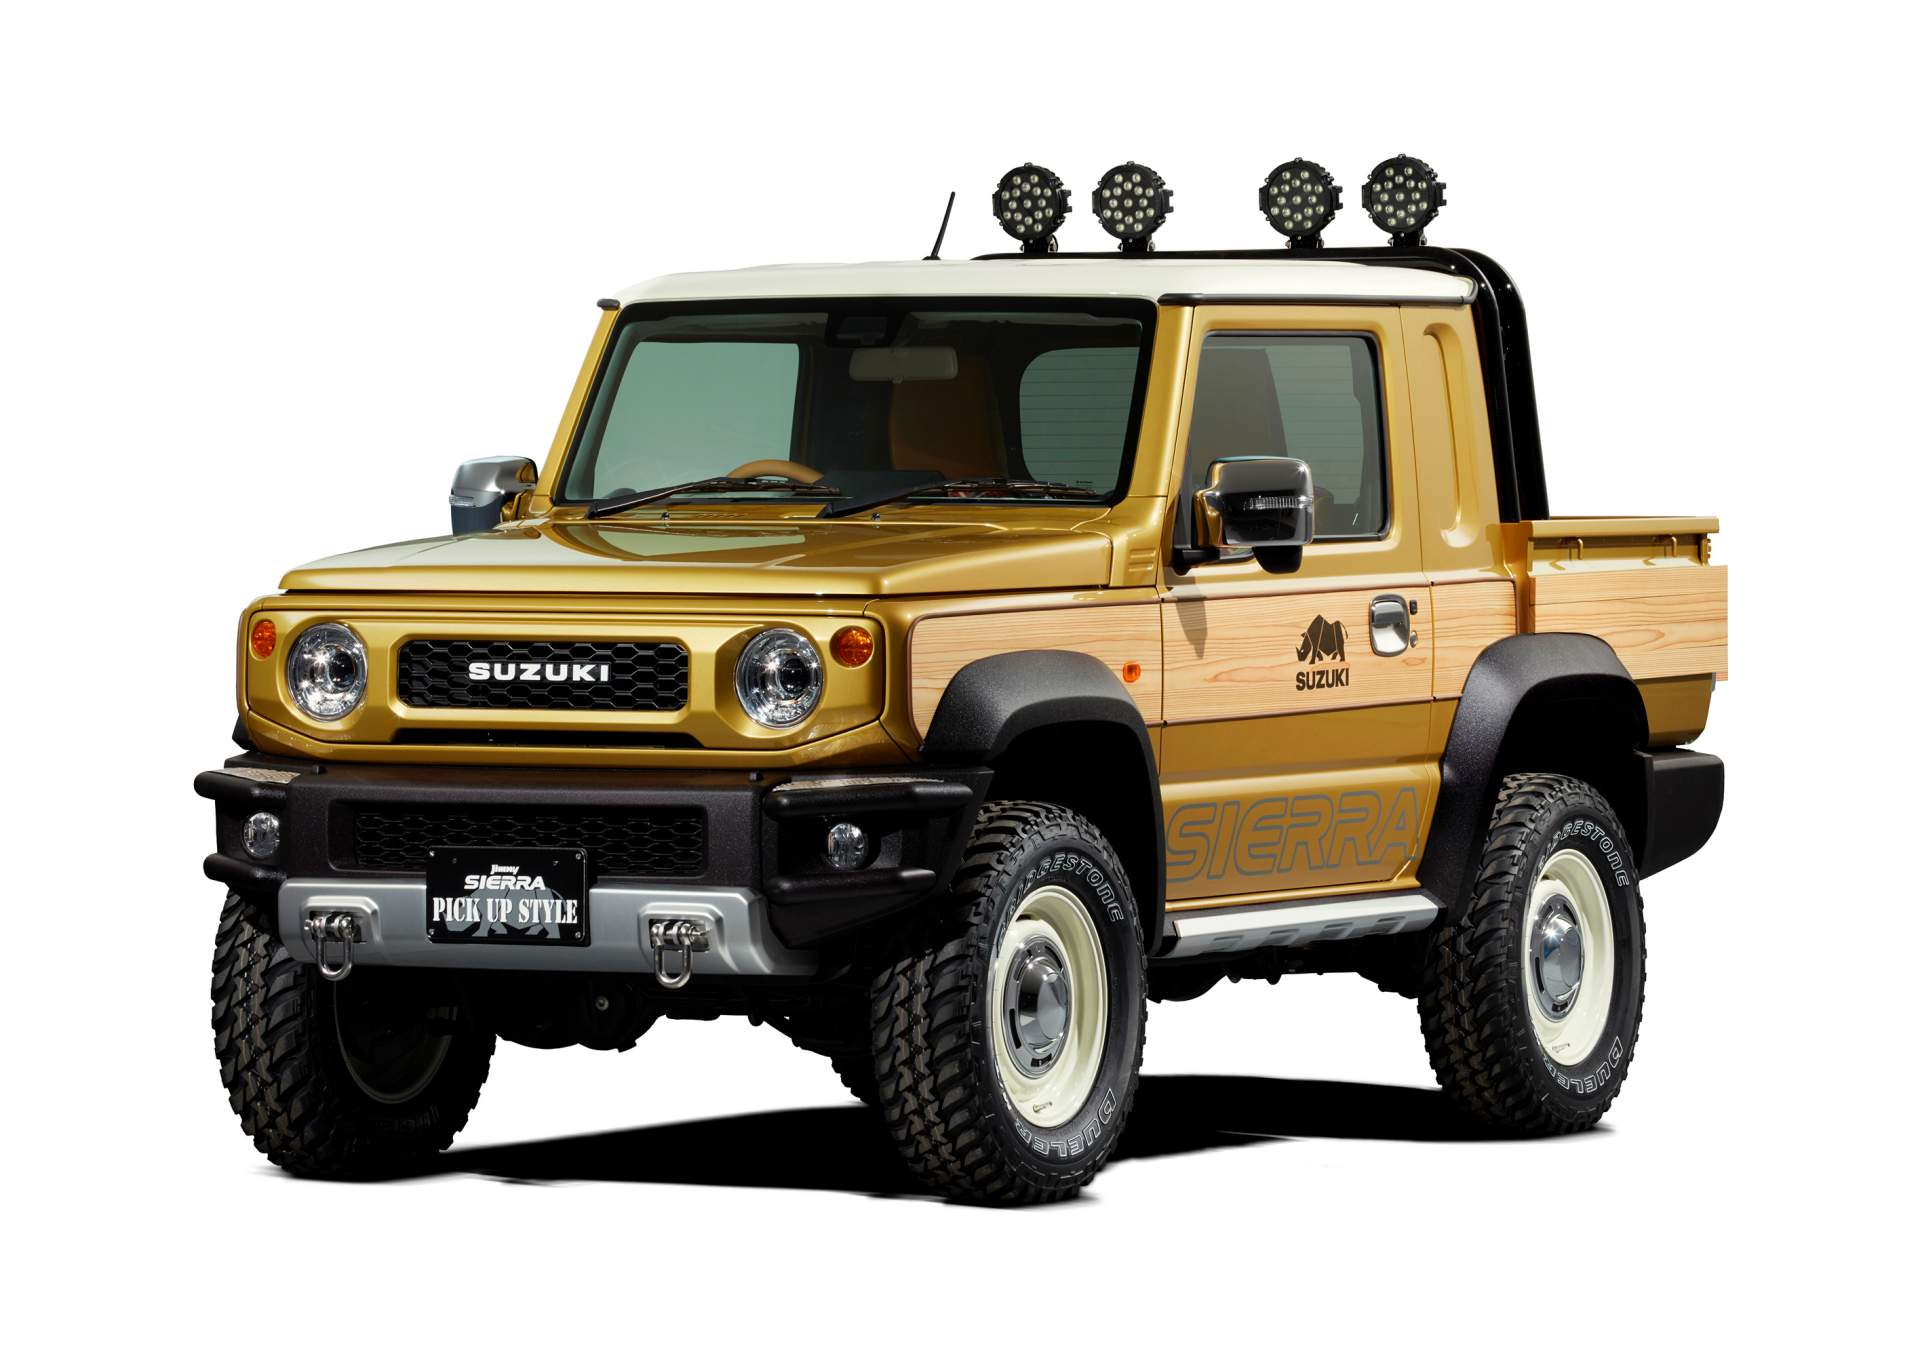 2019 suzuki jimny turned into pickup truck for tokyo auto salon autoevolution. Black Bedroom Furniture Sets. Home Design Ideas